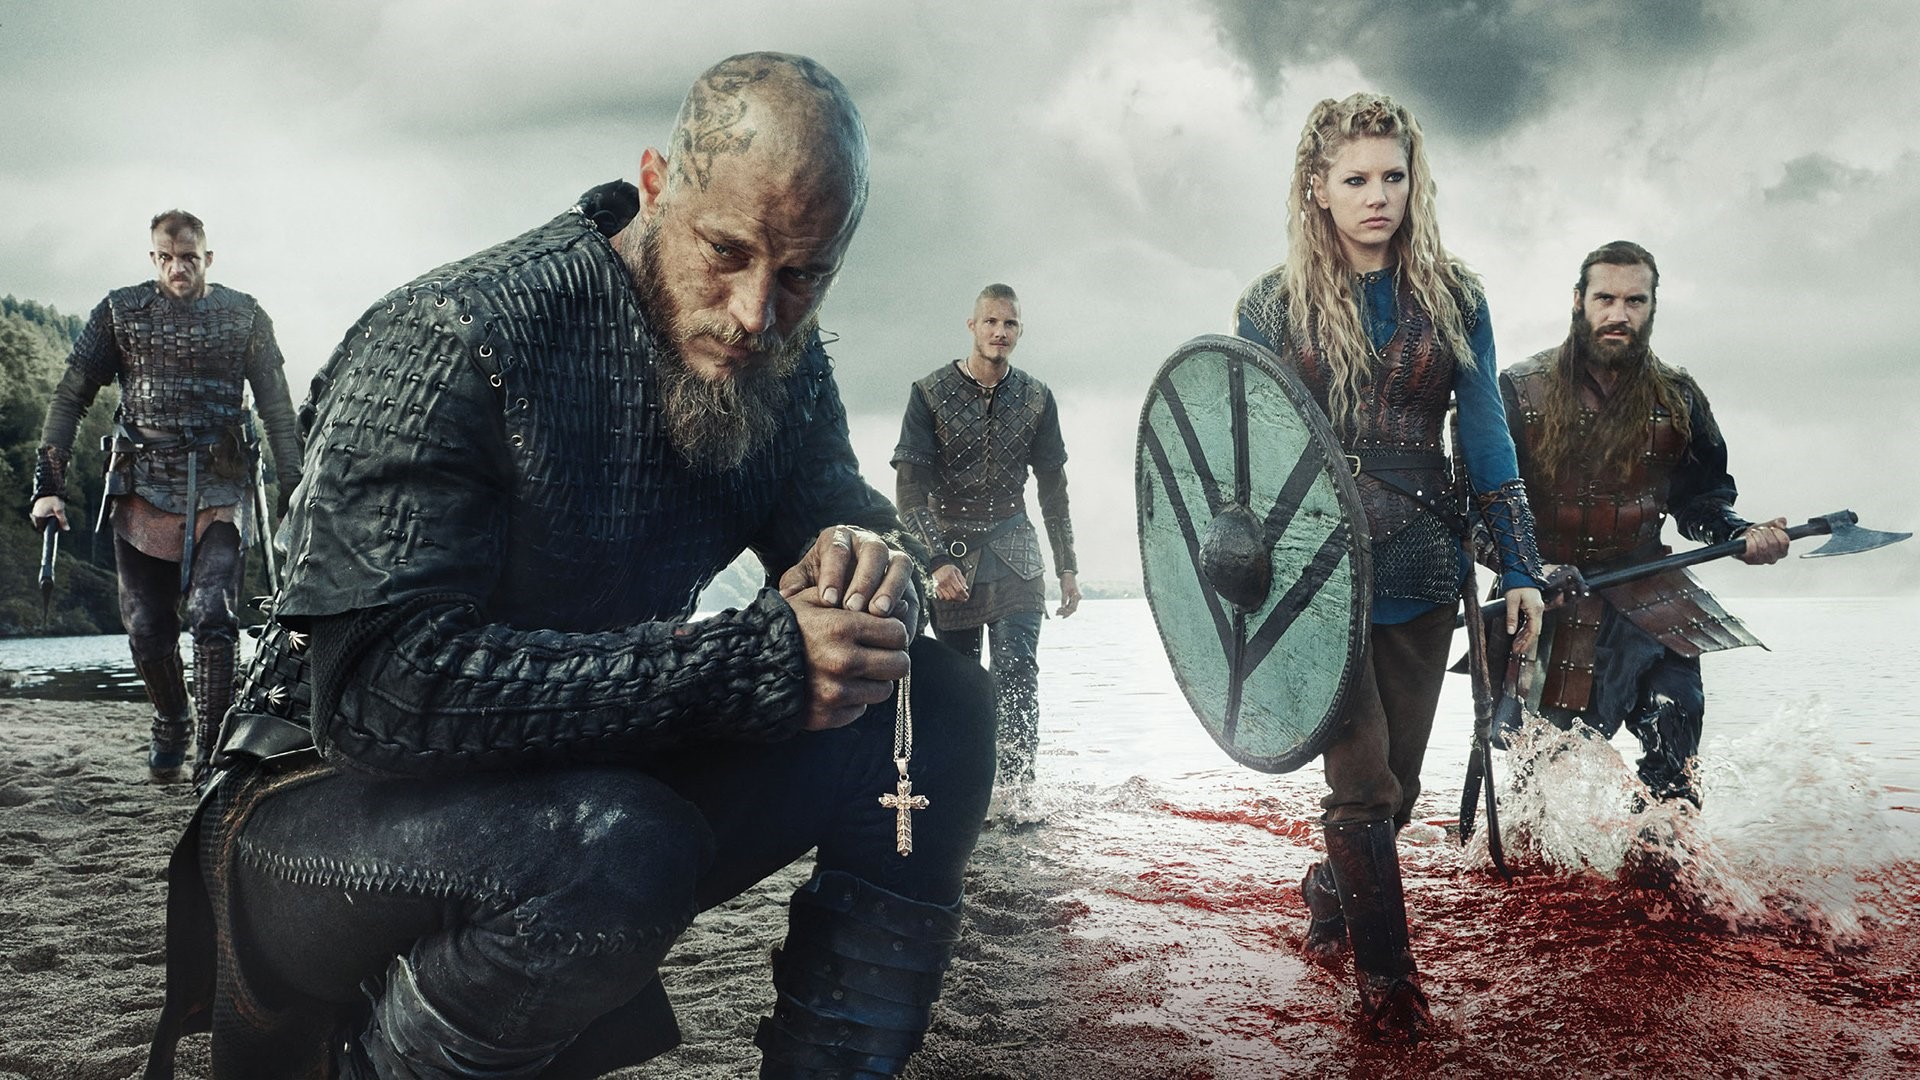 Vikings 4K Wallpapers